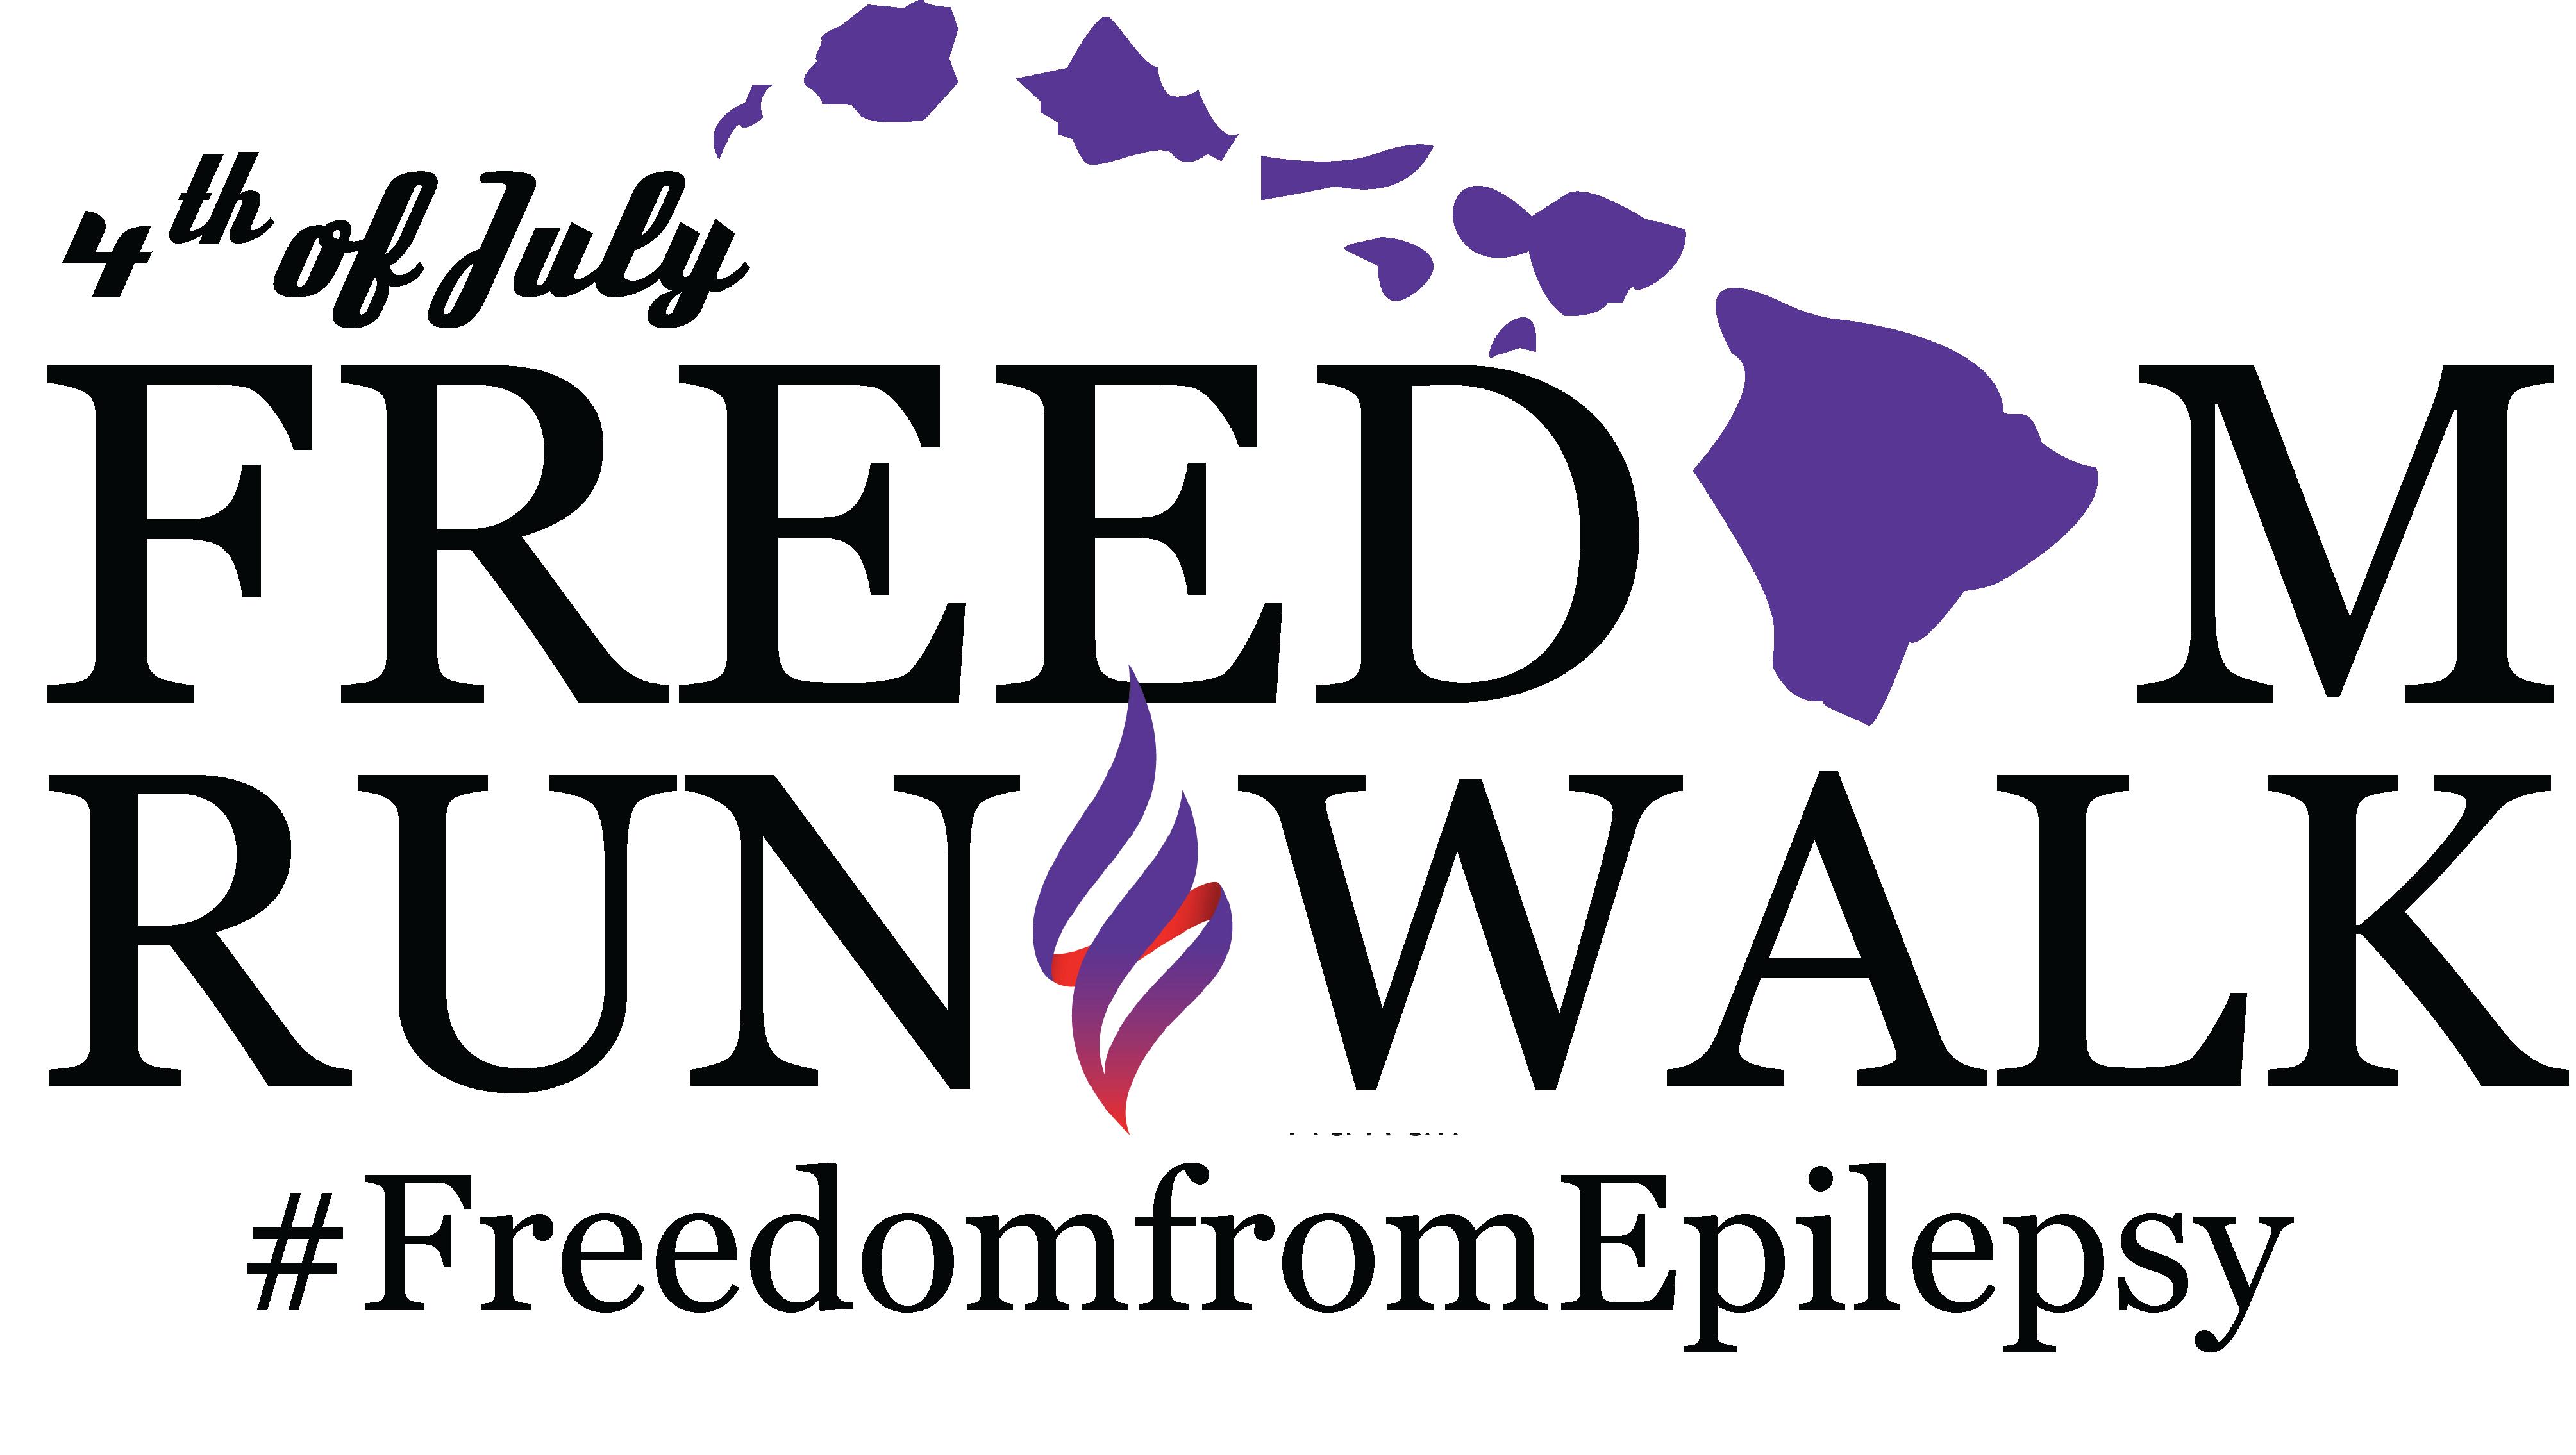 4th of July Freedom Run 2018